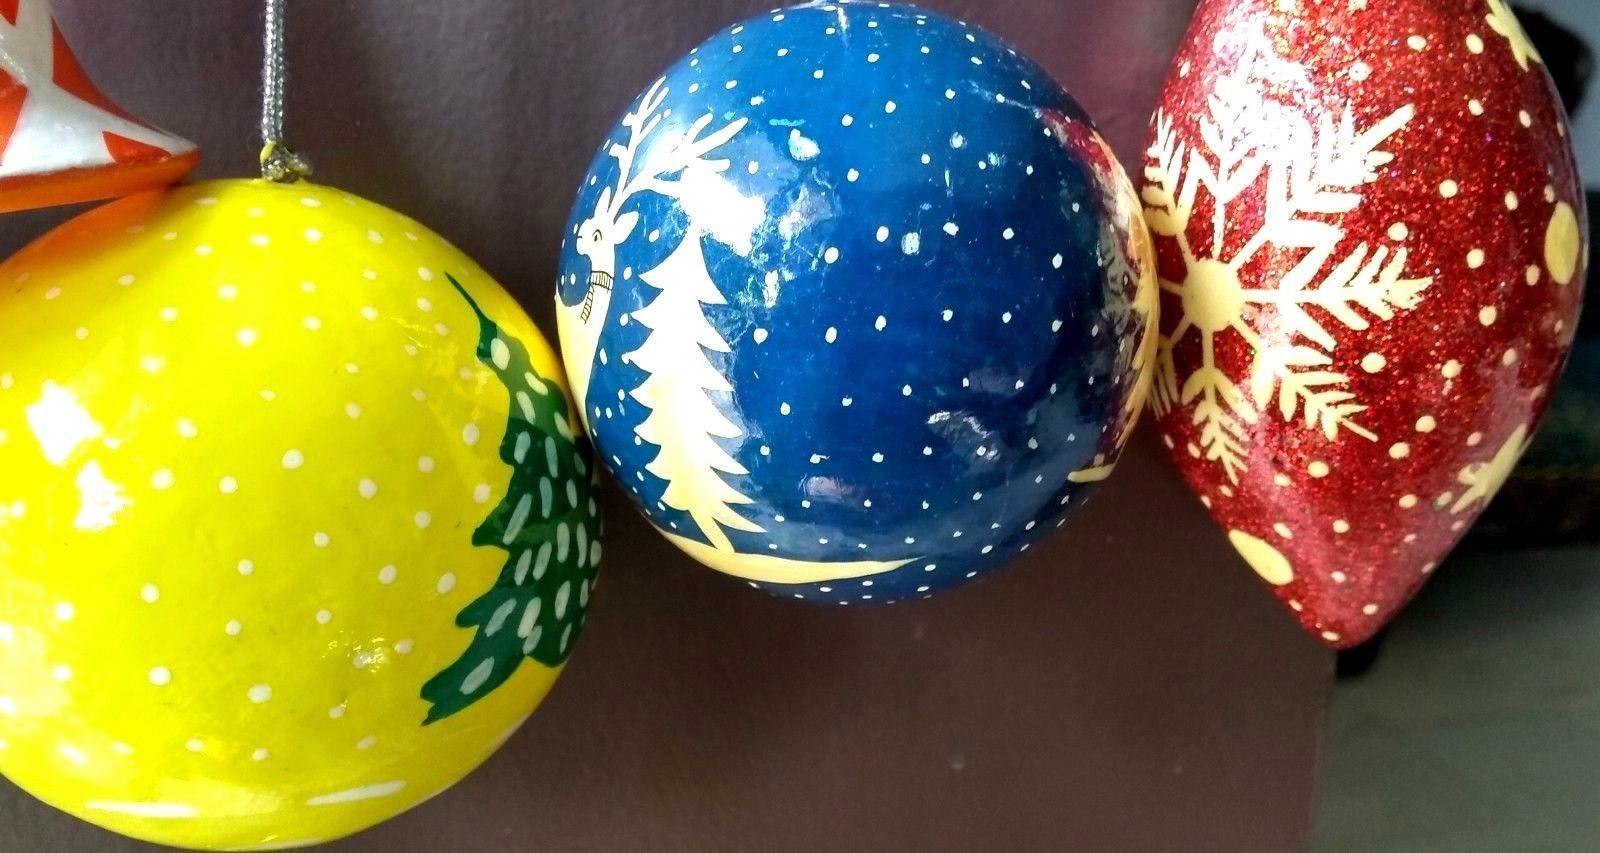 6 pc Christmas tree decoration ornaments paper mache balls bells heart star